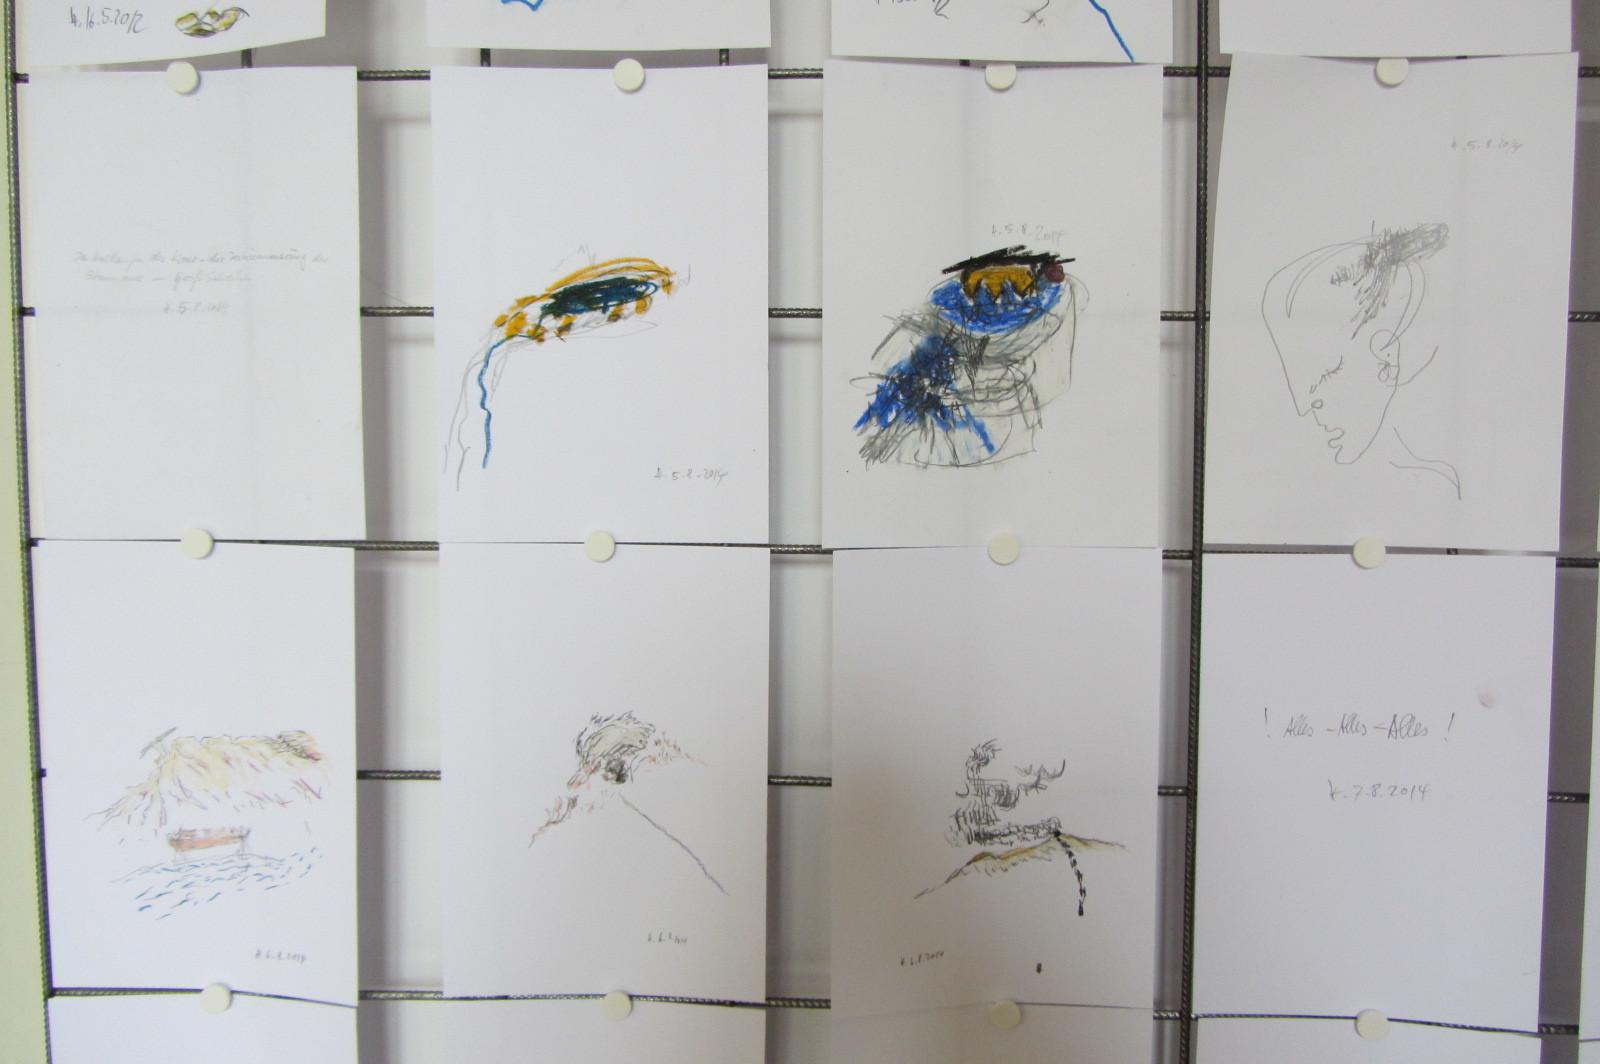 Oko pamięci, rysunki Horsta Hoheisela